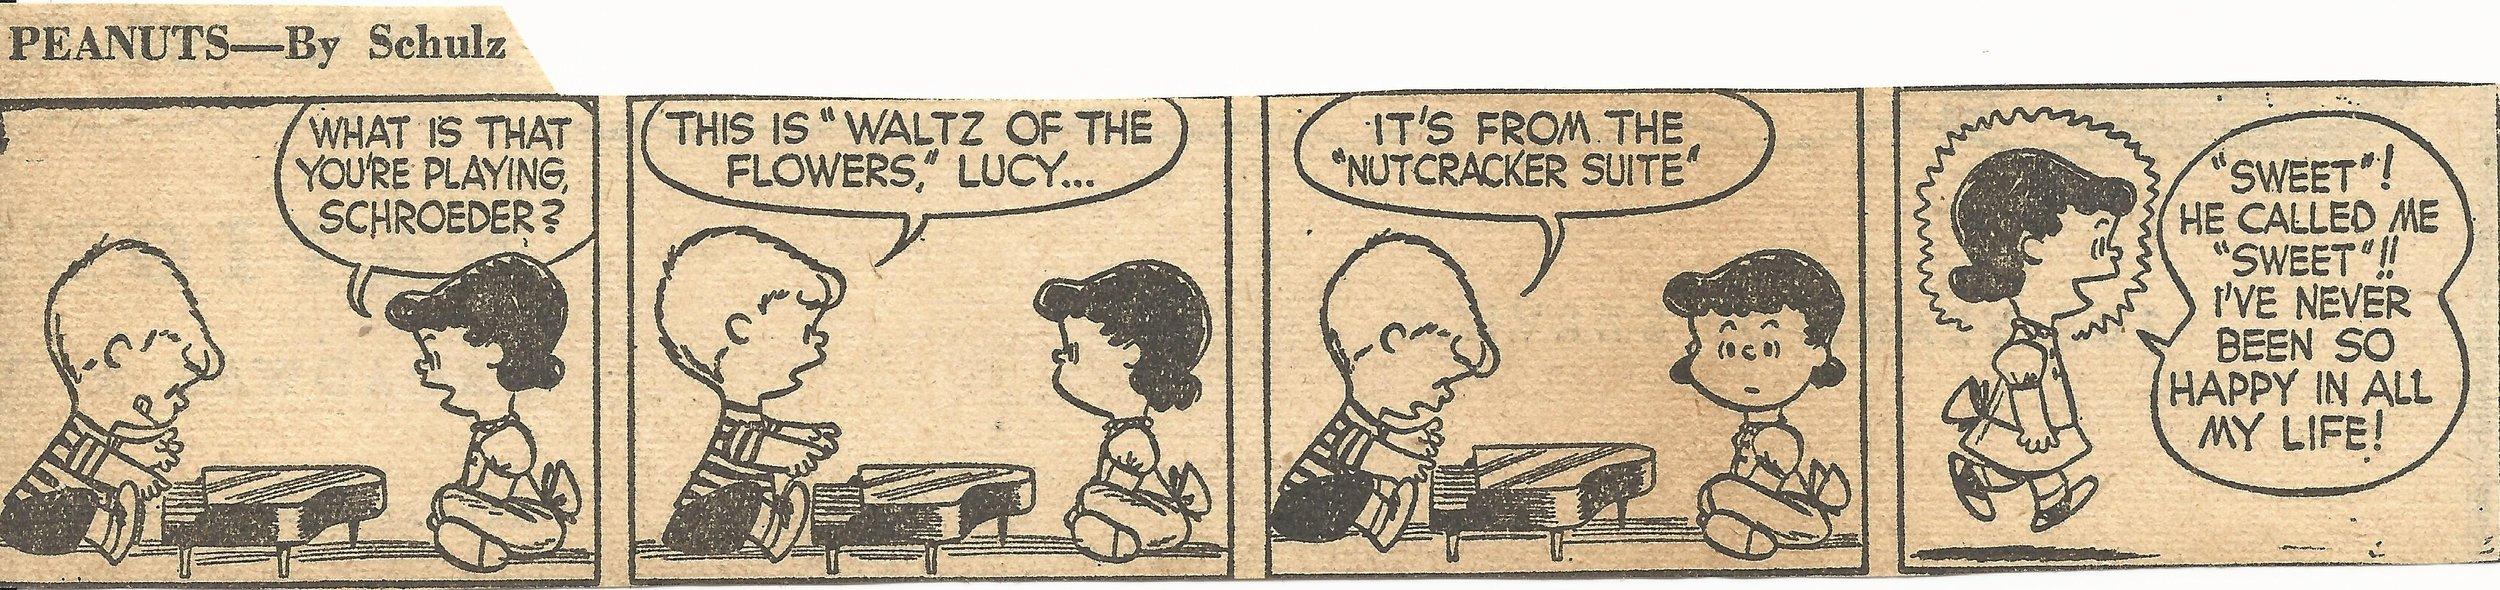 15. Jan. 28, 1953 (Oma)_Page_6 (4).jpg